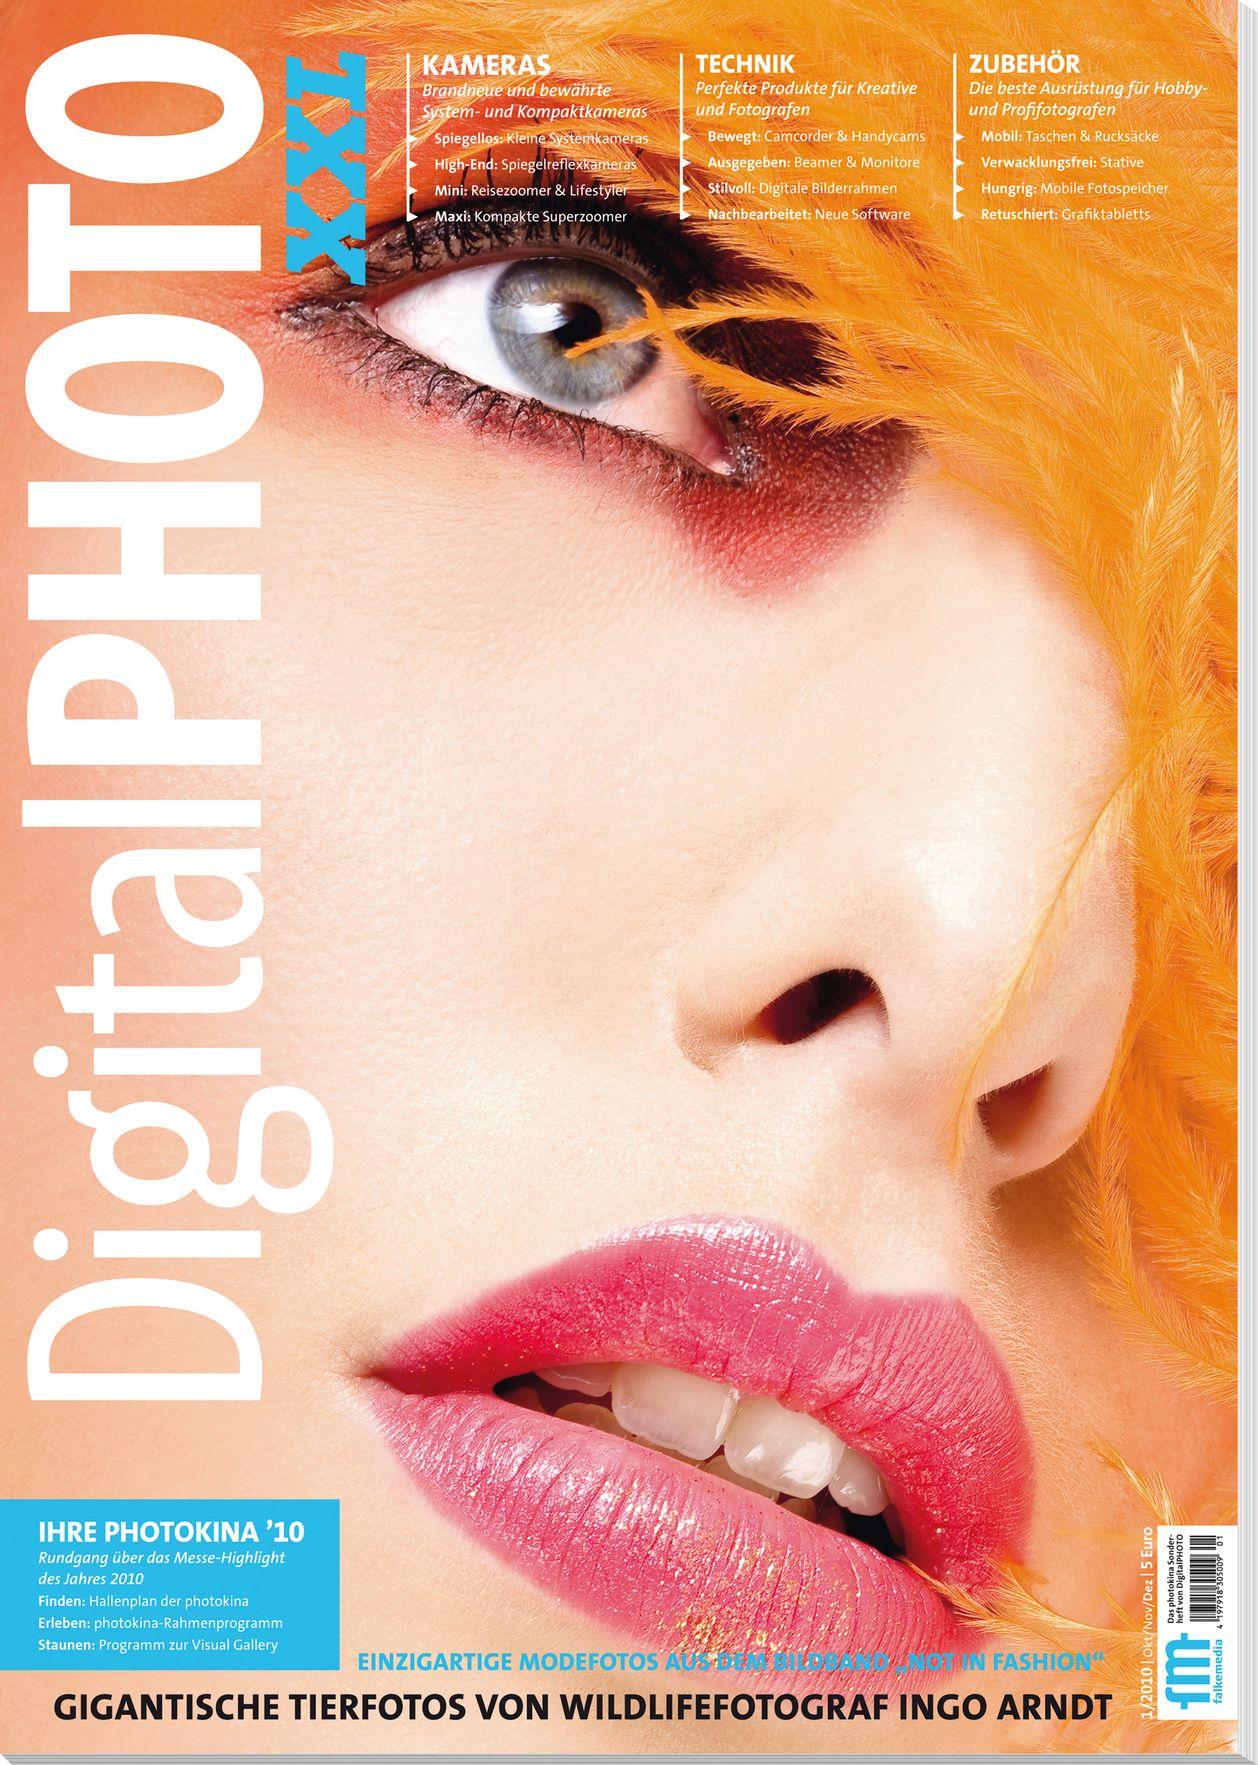 digitalphoto-xxl